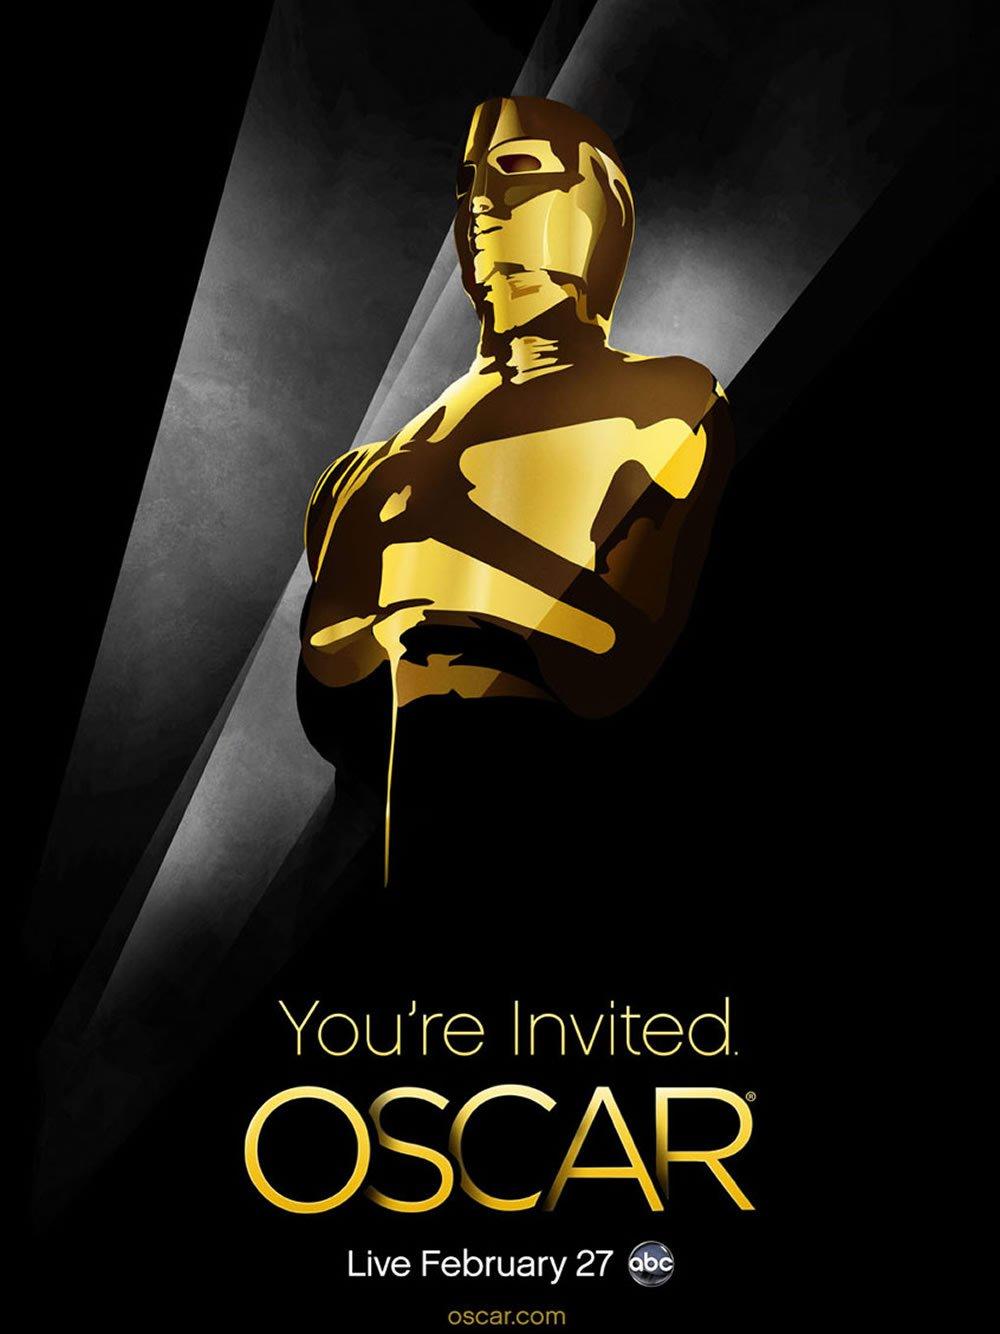 Oscar Academy Award 2011 Poster Original Theatrical Movie Poster Single Sided 27 X40